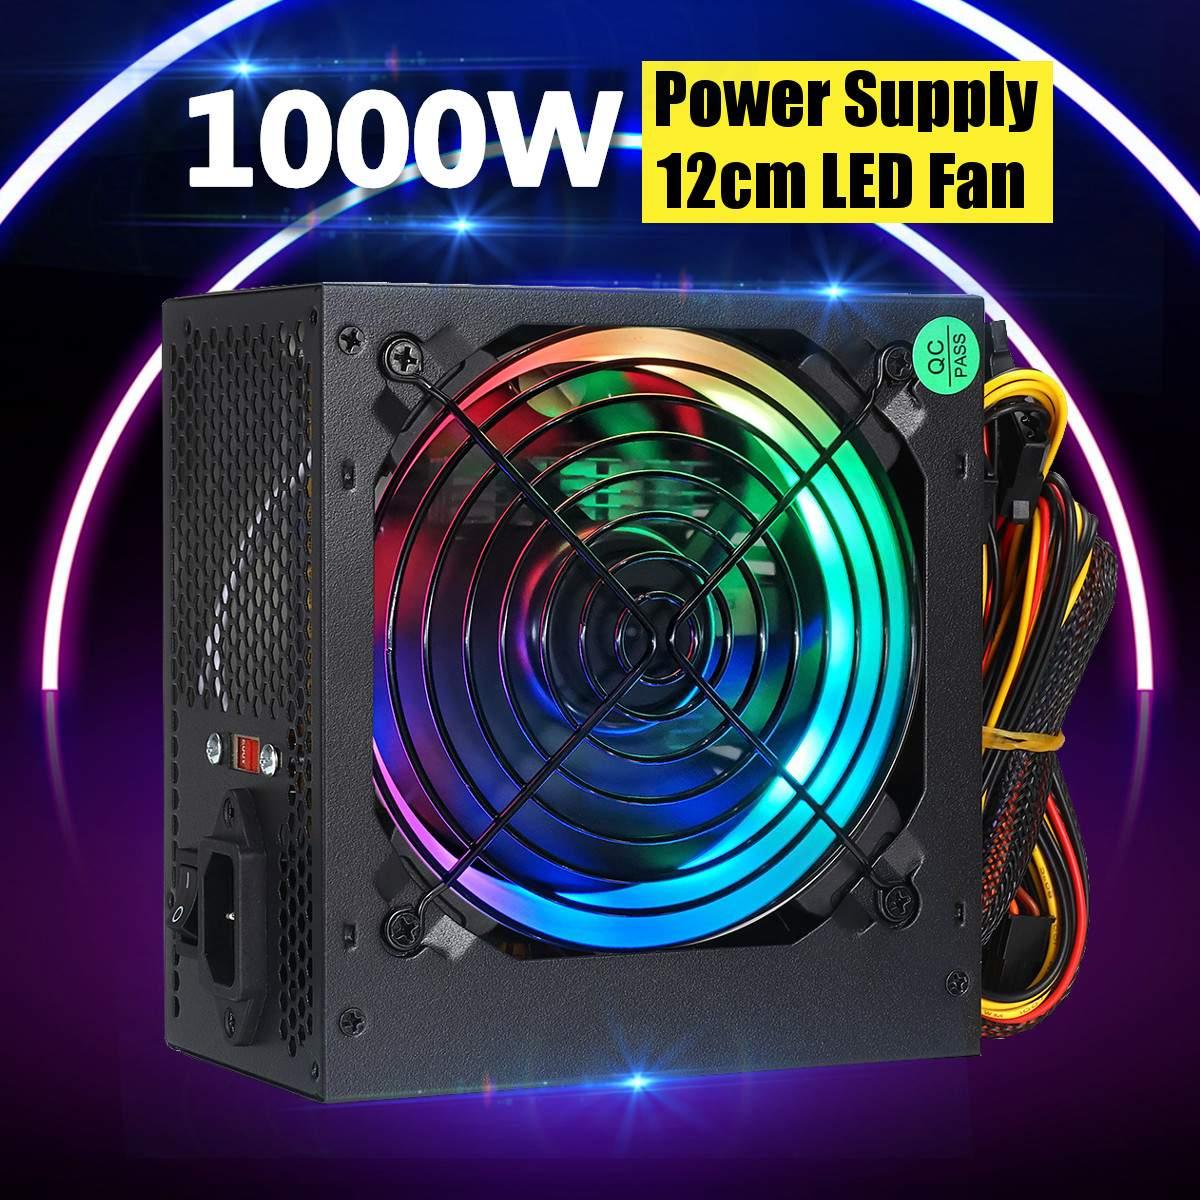 Max 1000W Power Supply PSU Silent 12cm LED Rgb Fan ATX 24pin 12V PC Computer SATA Gaming PC Power Supply For Intel AMD Computer